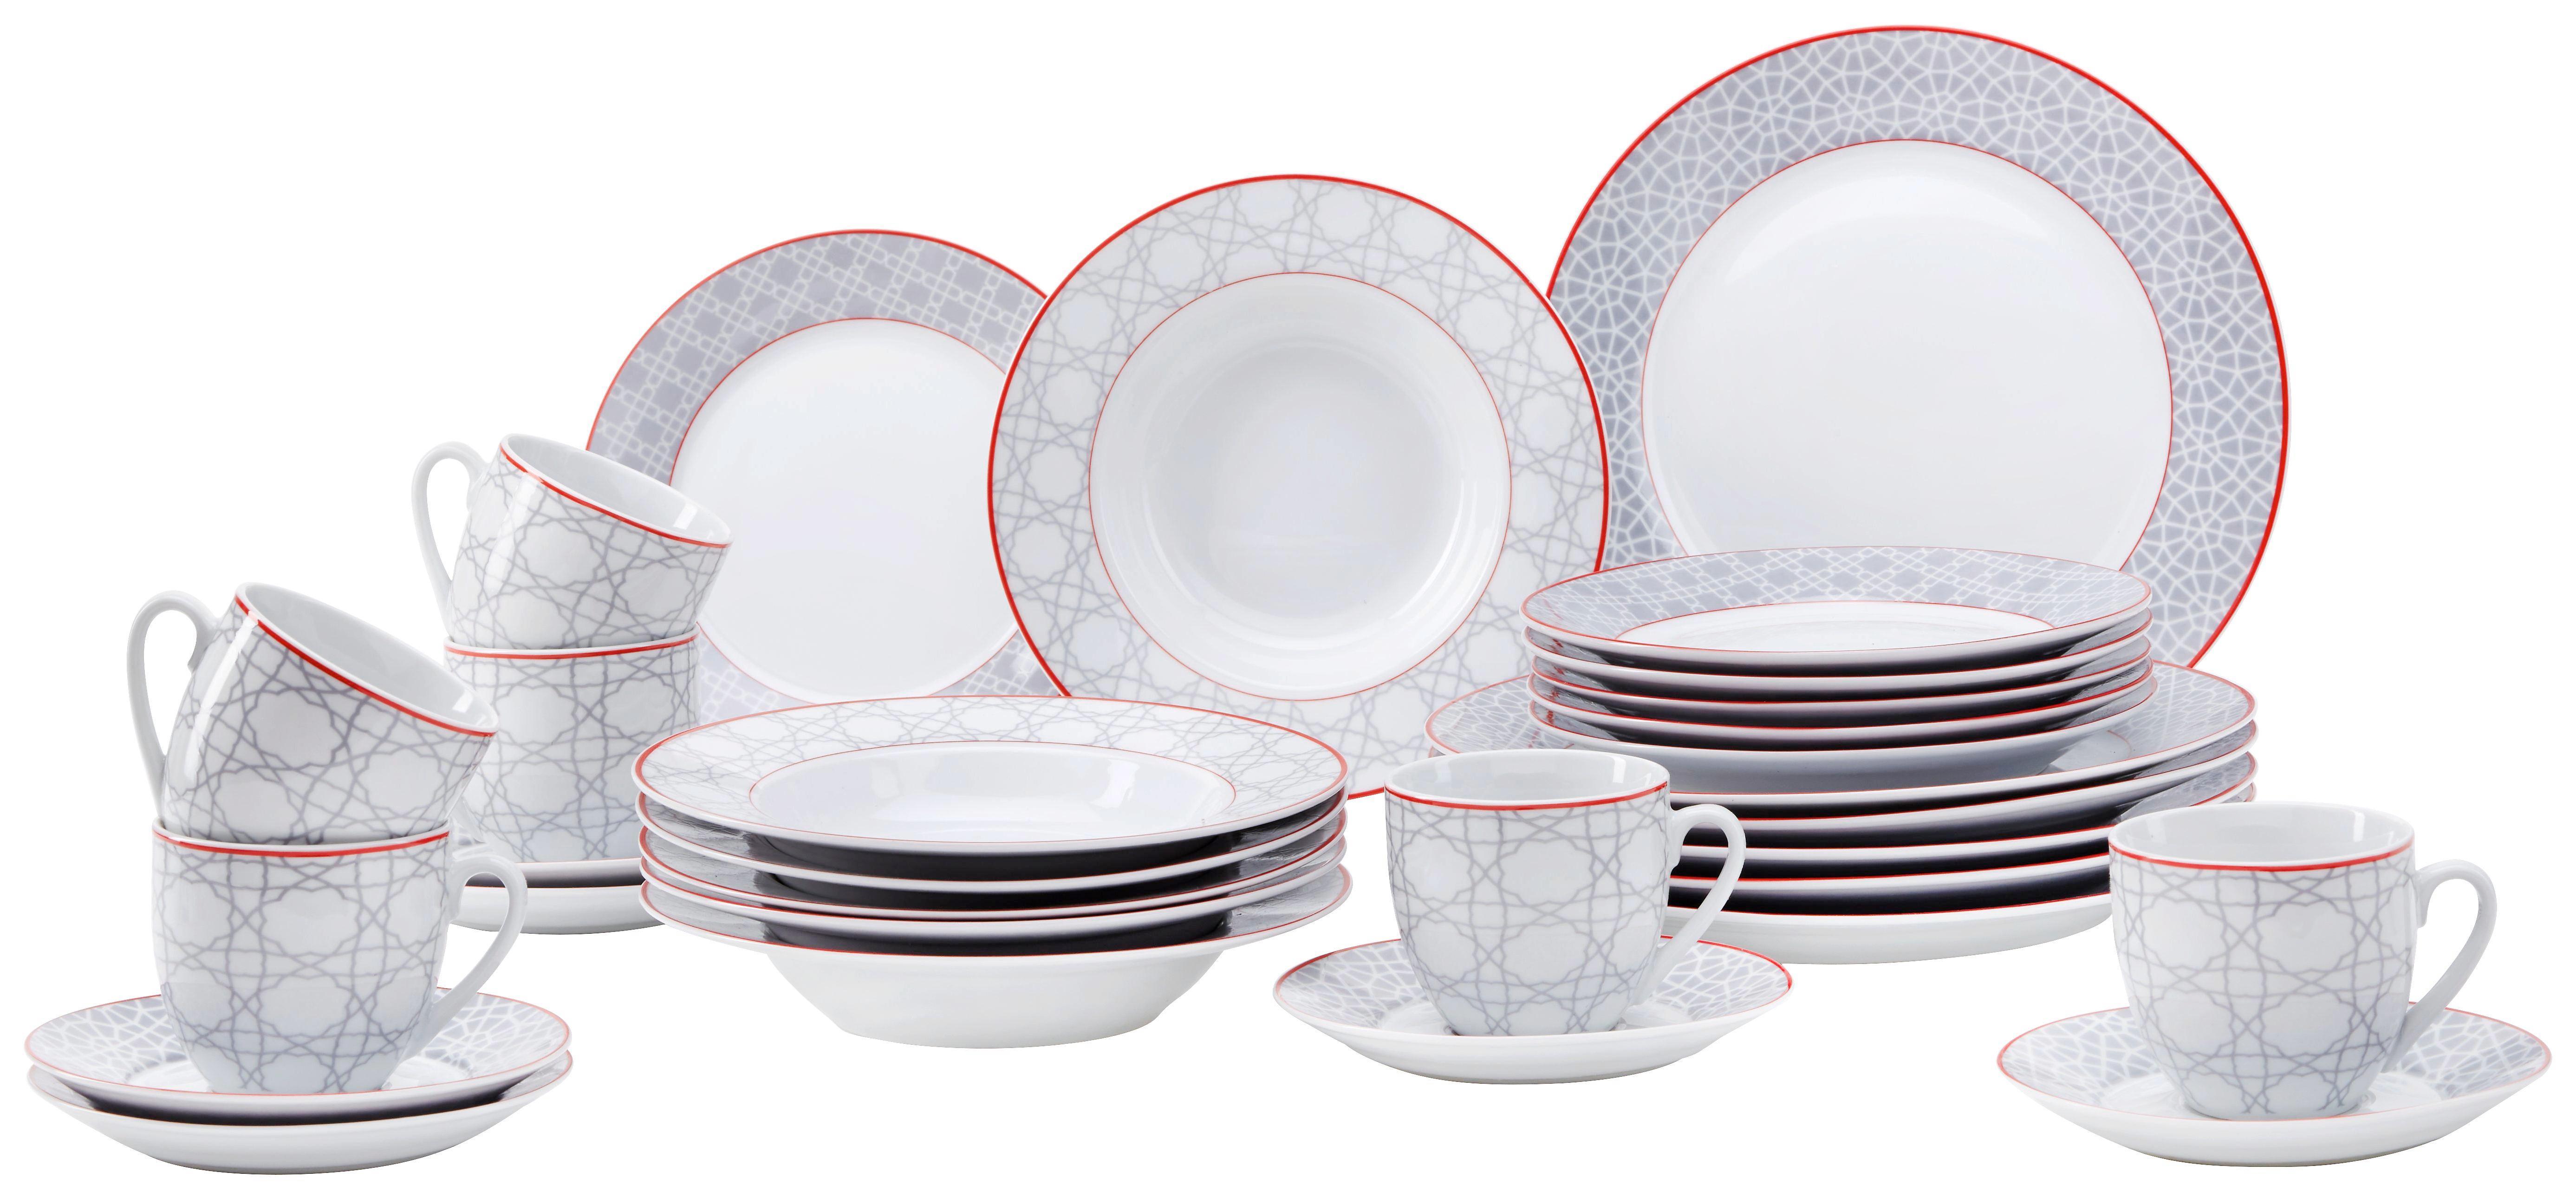 Kombiservice Bouquet 30-tlg aus Porzellan - Rot/Weiß, LIFESTYLE, Keramik (28,5/31,3/28,5cm) - MÖMAX modern living